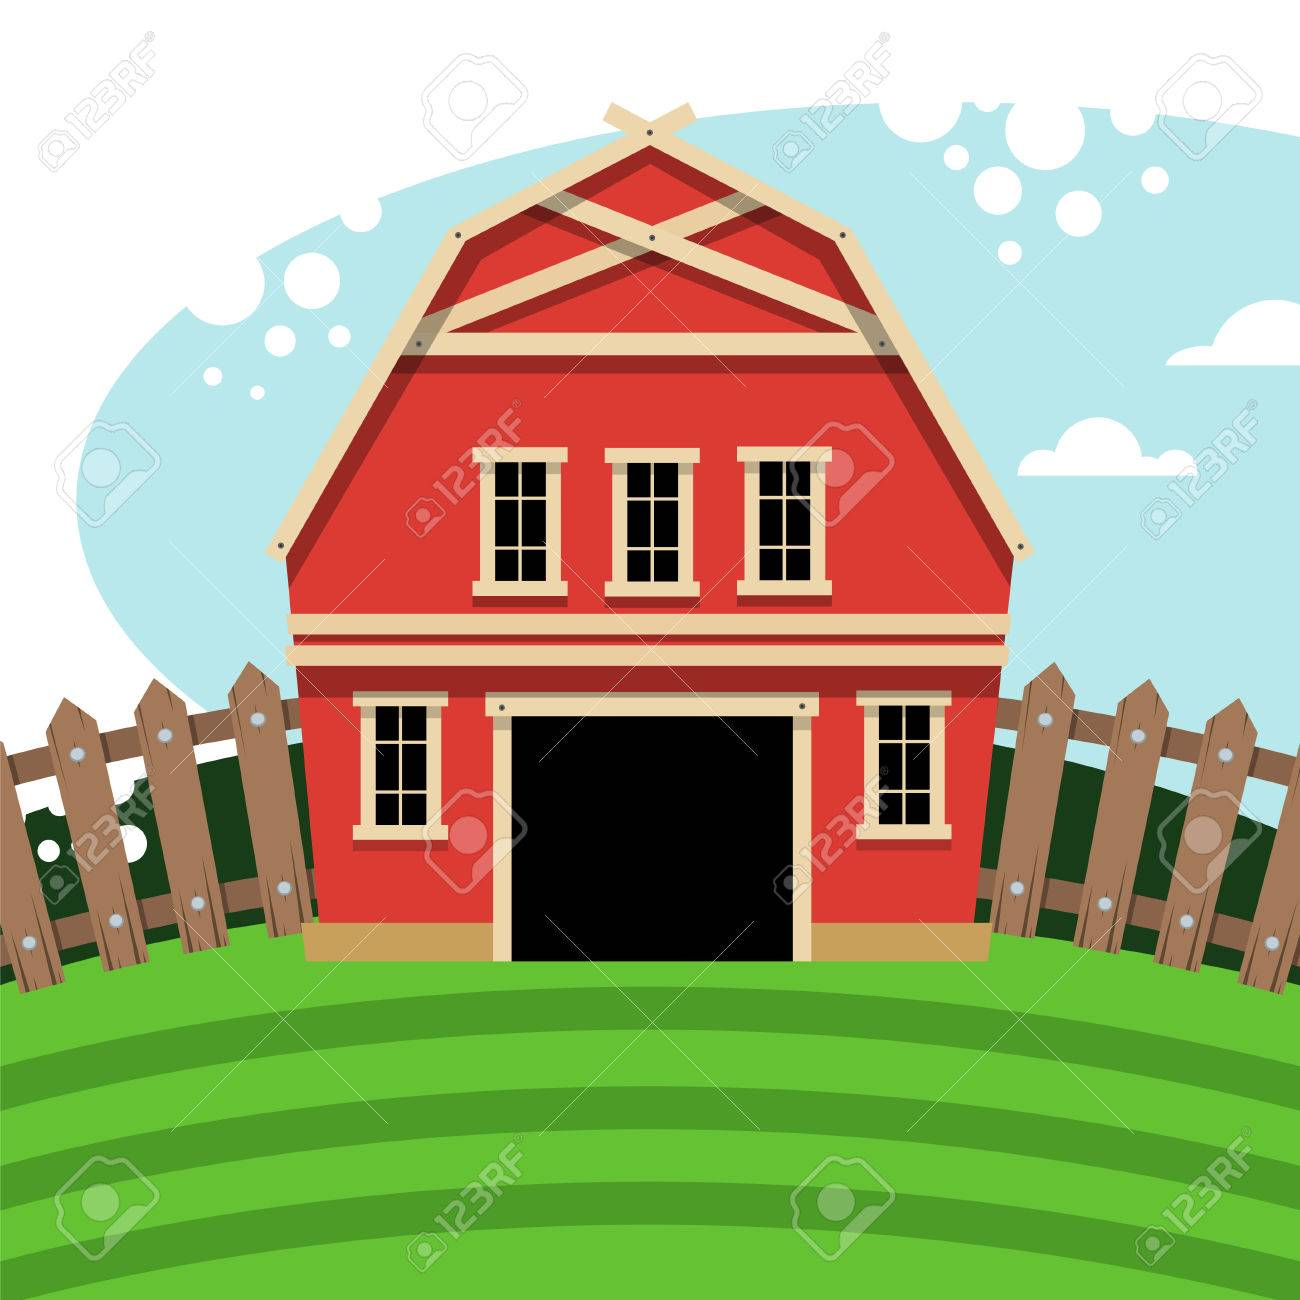 farm barn clip art. Red Farm Barn. Rural Landscape In Flat Style. Vector Illustration. Stock - Barn Clip Art